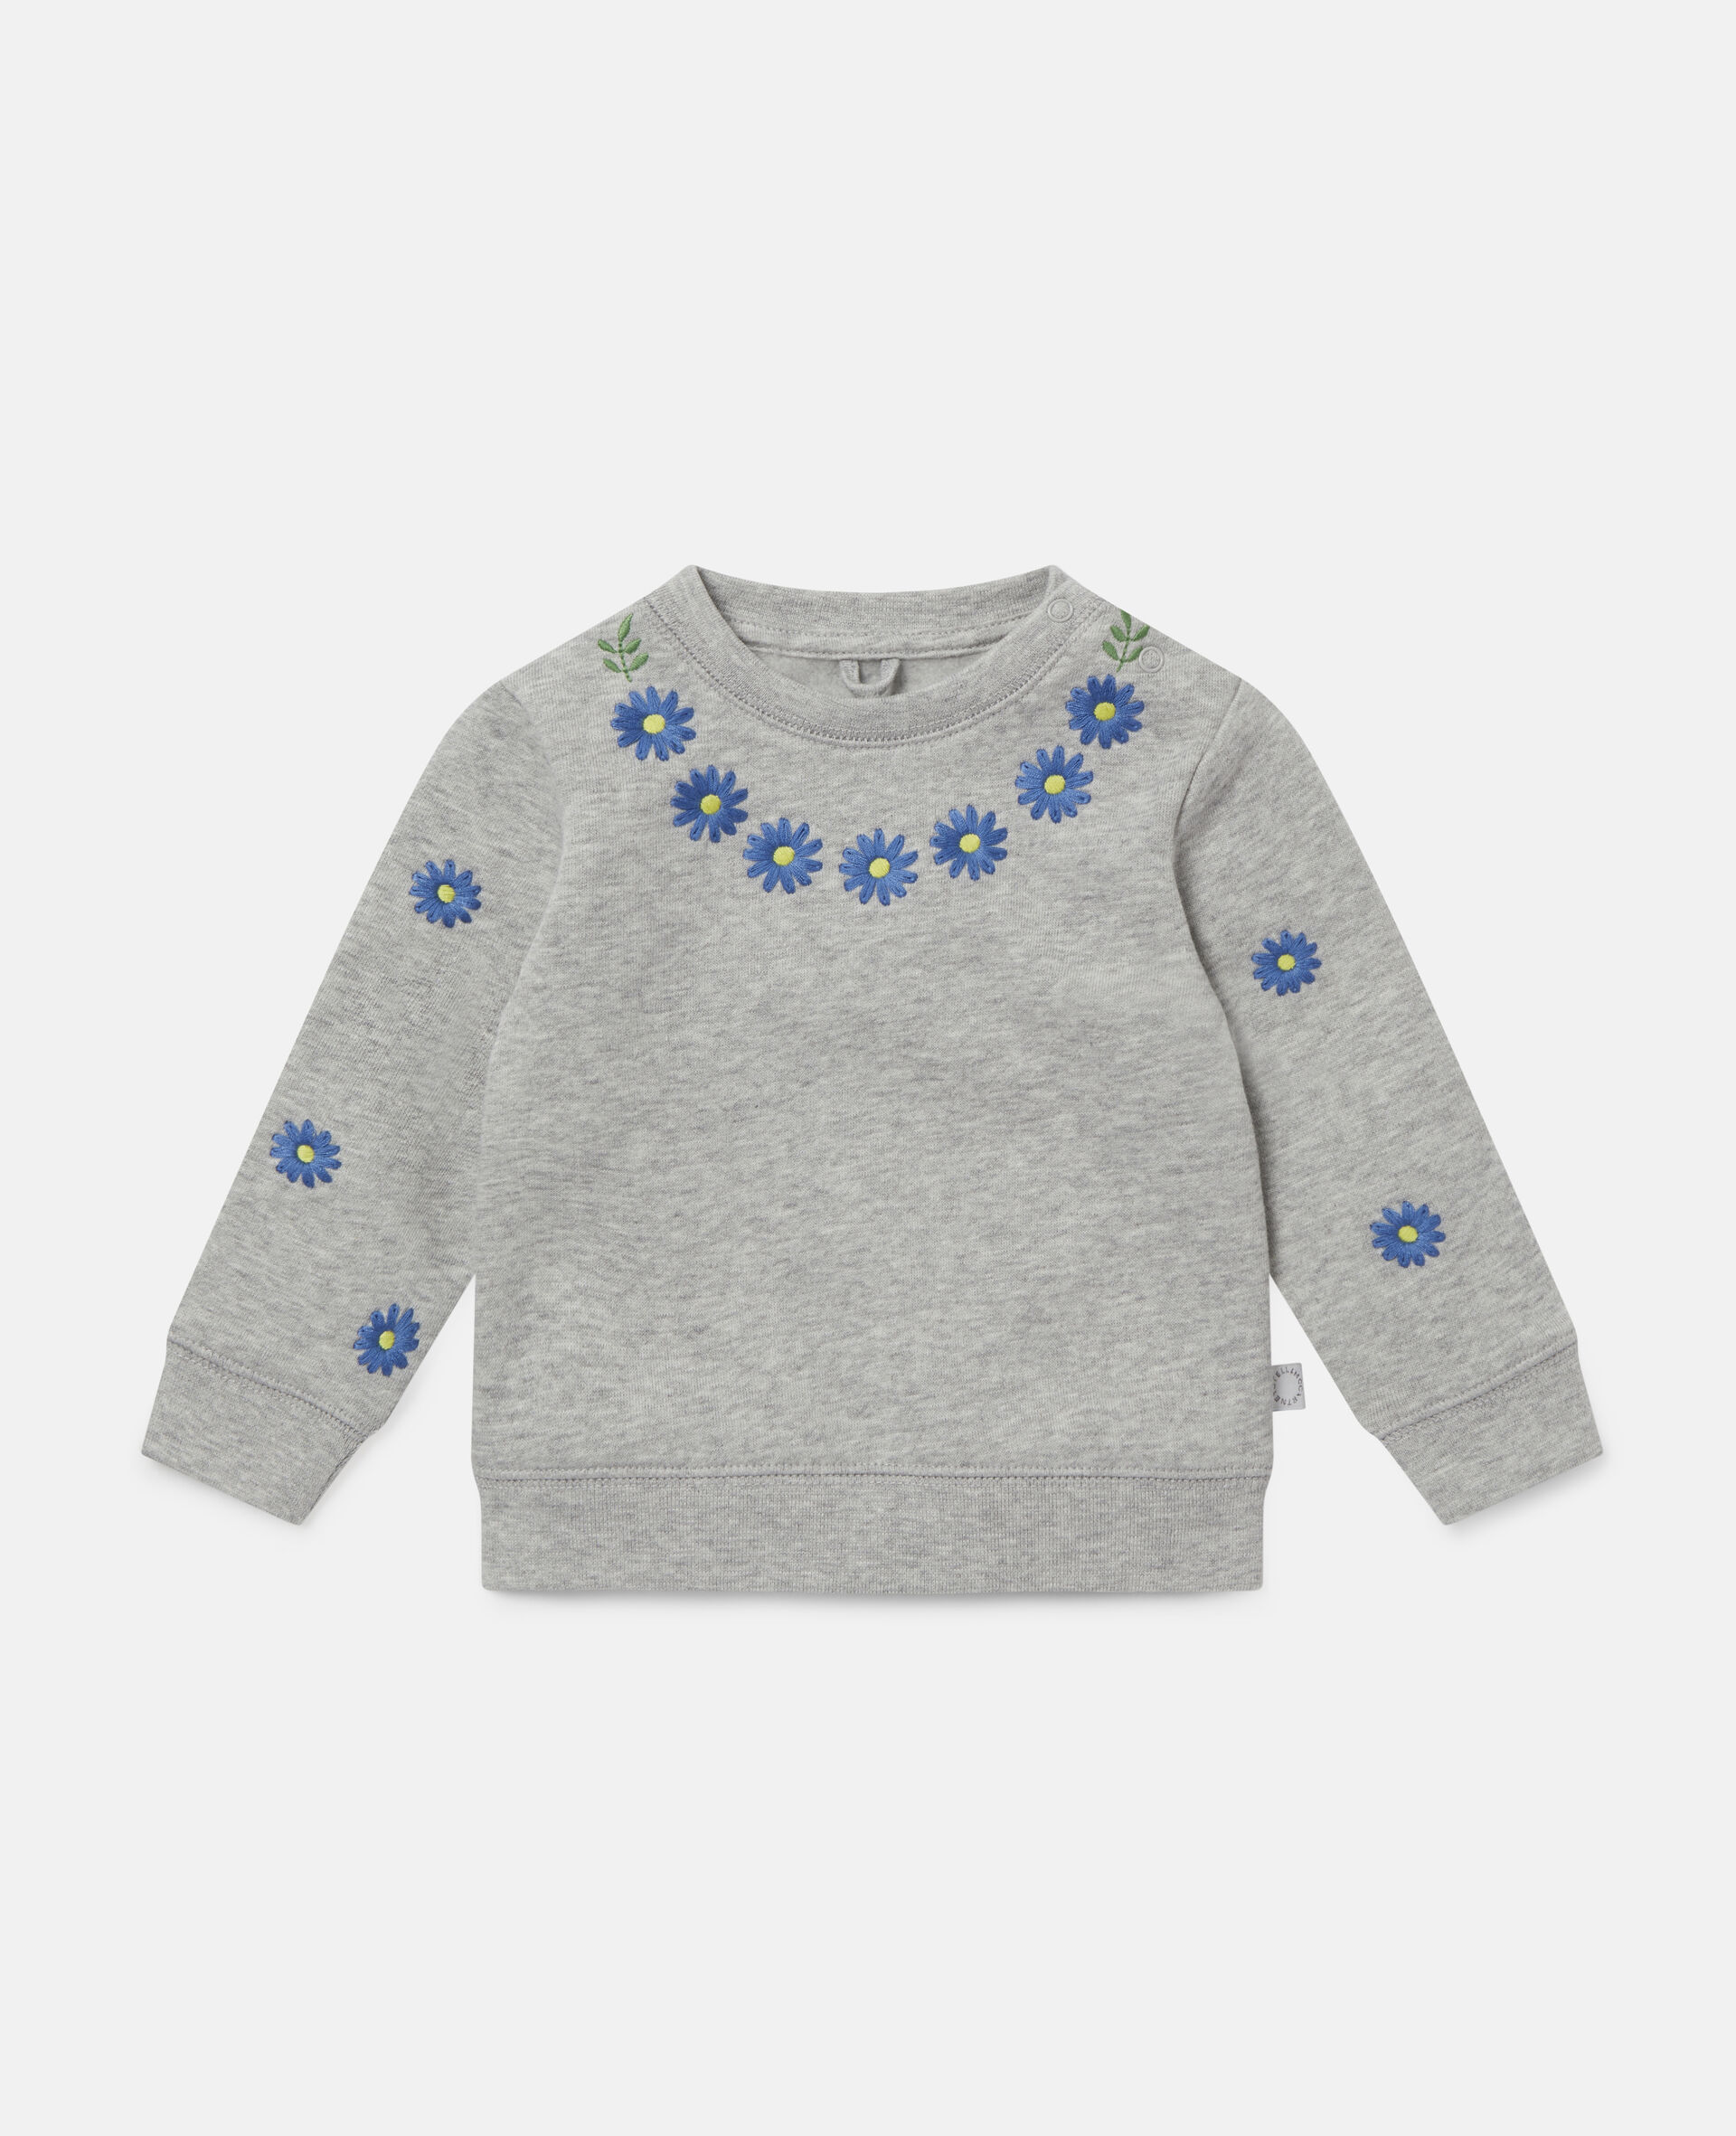 Embroidered Daisies Fleece Sweatshirt -Grey-large image number 0